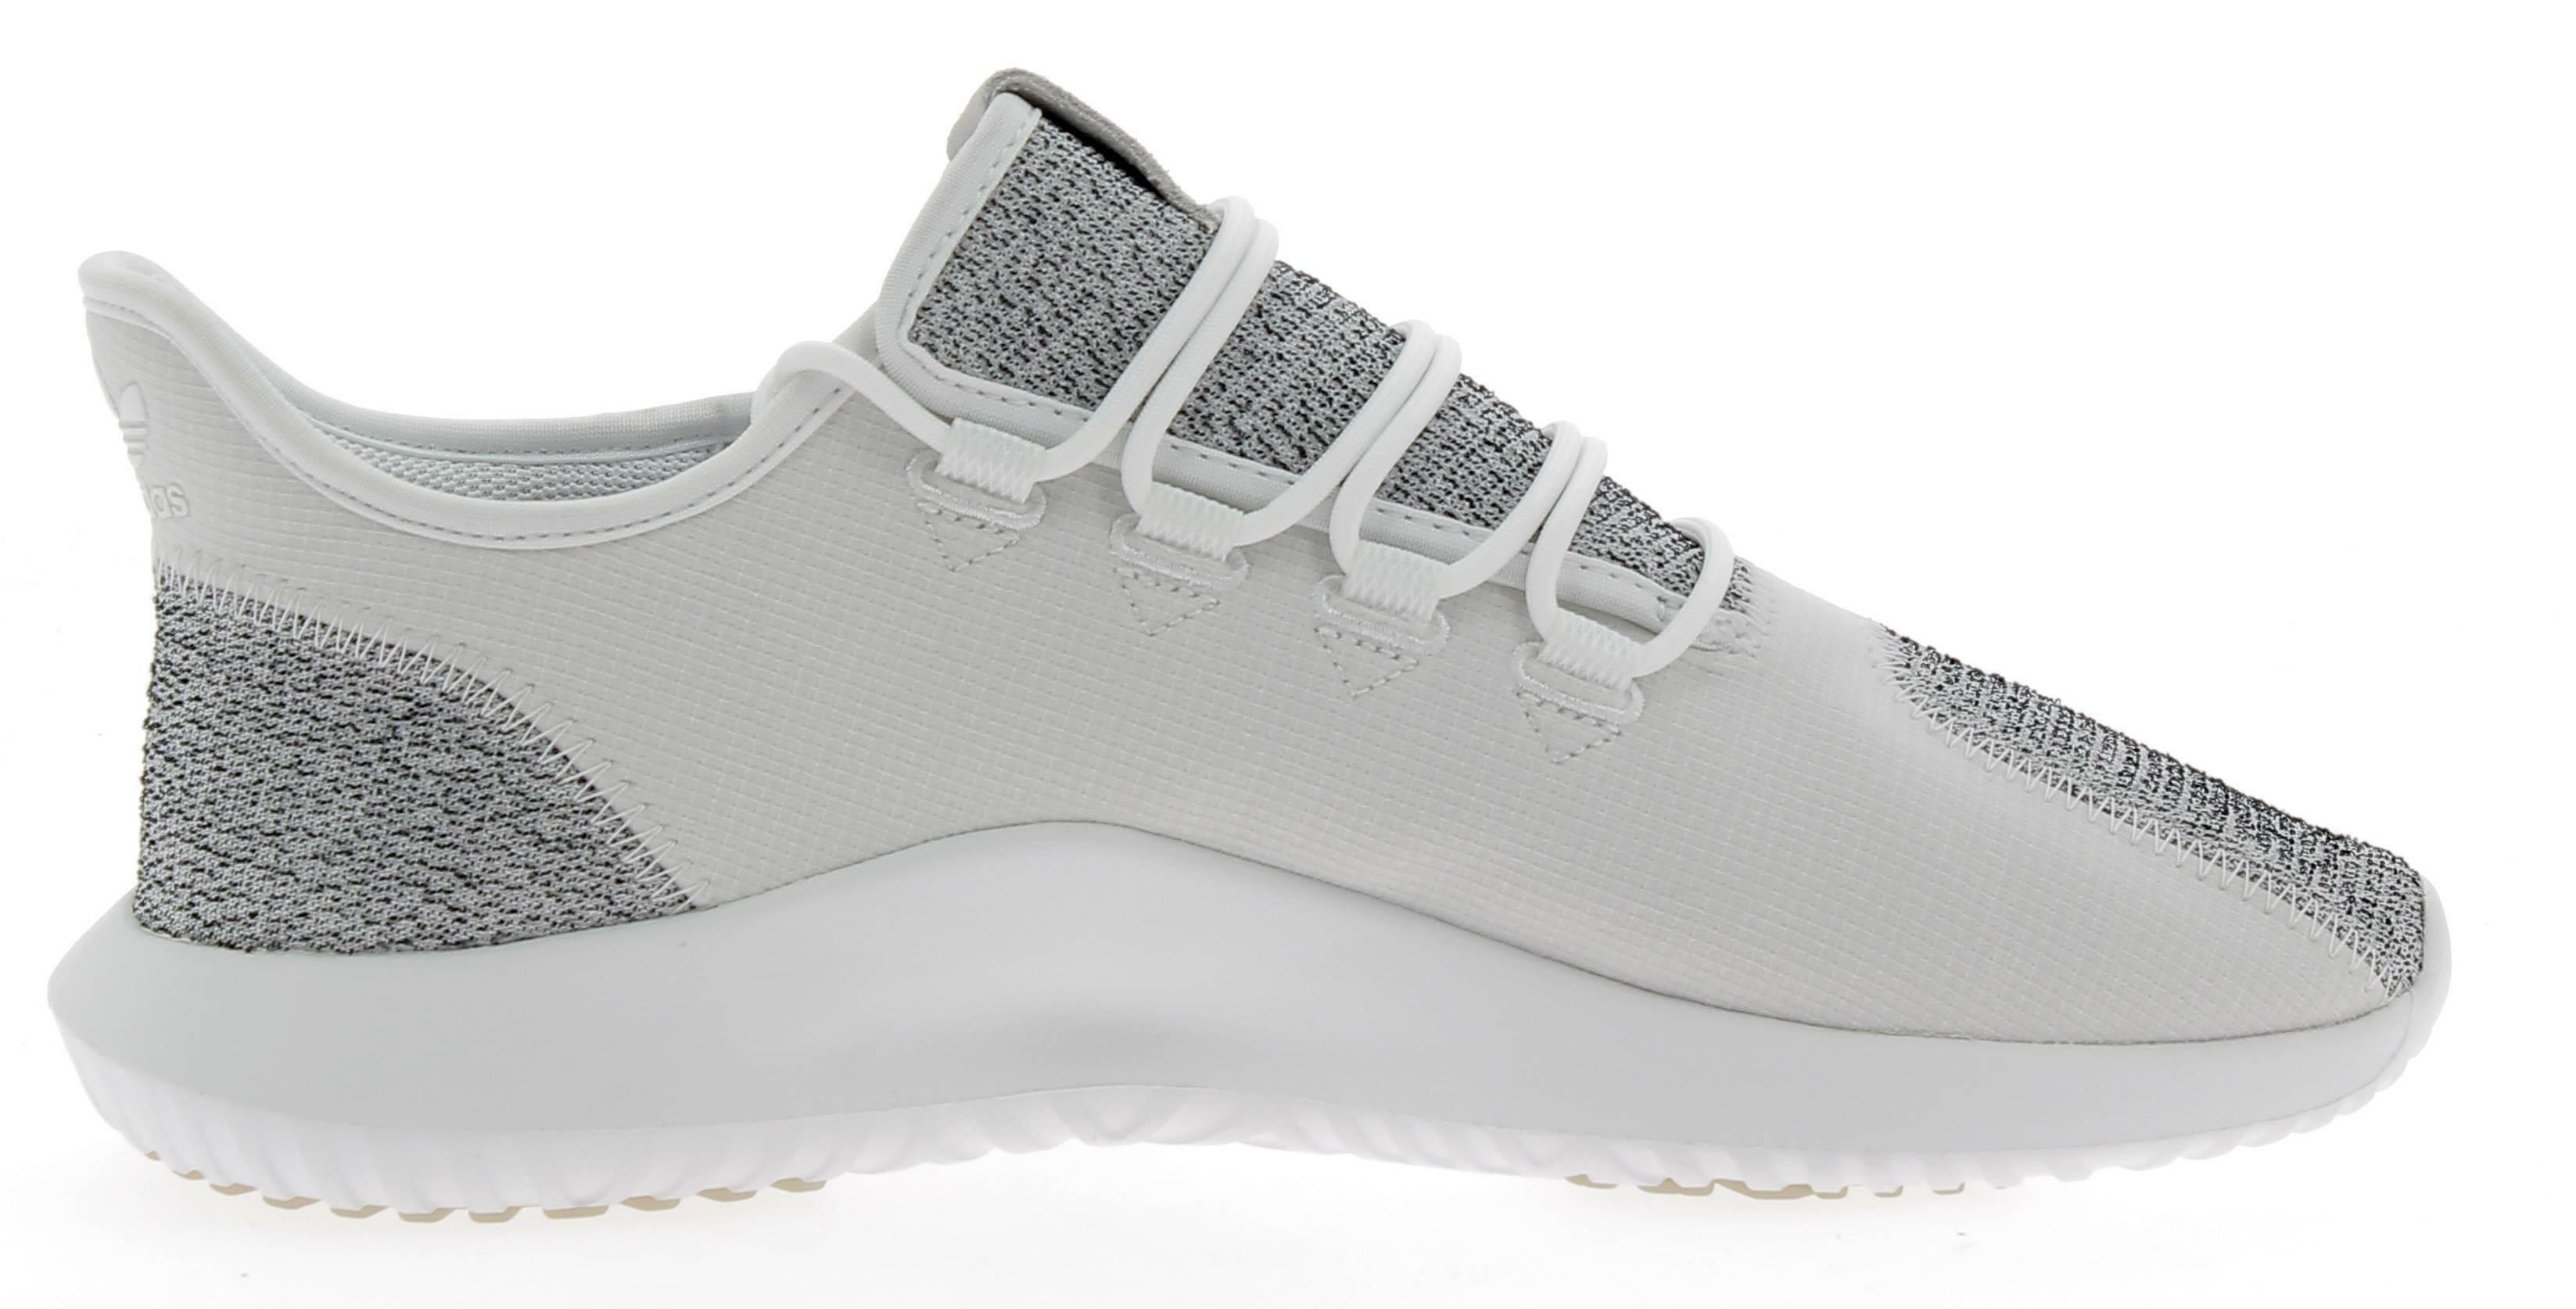 adidas adidas tubular shadow scarpe sportive uomo grigie